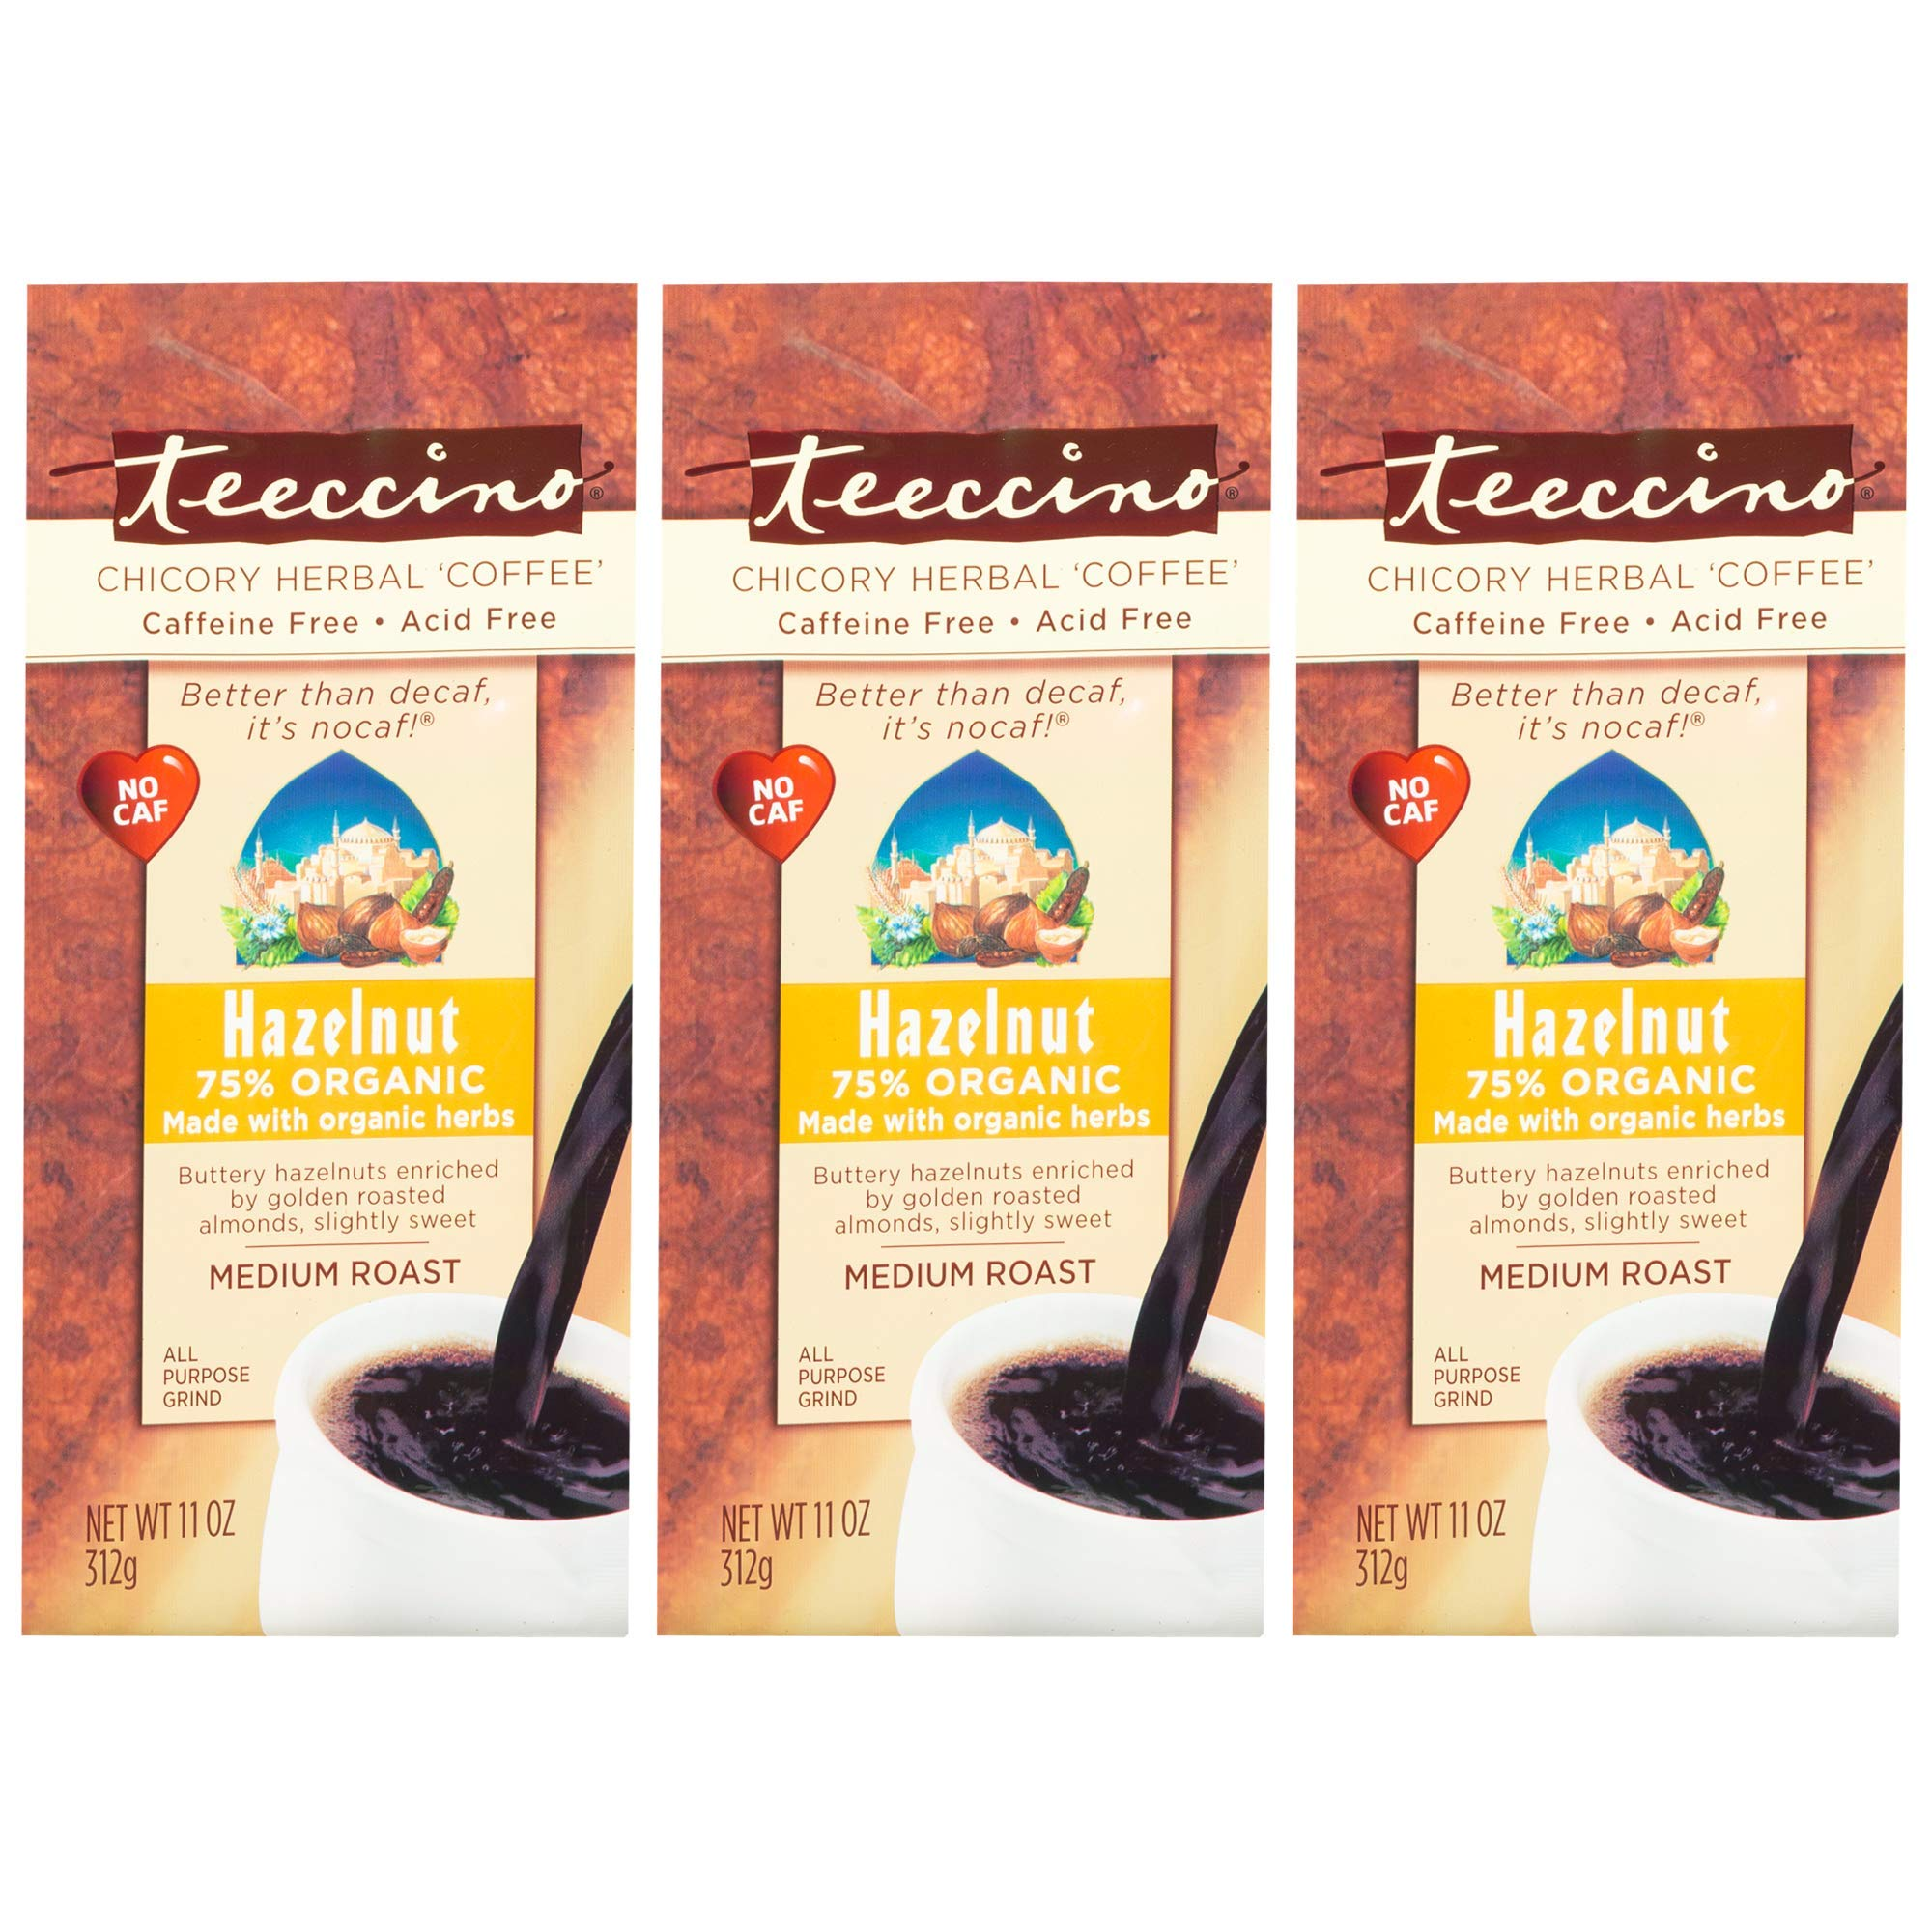 Teeccino Hazelnut Chicory Herbal Coffee Alternative, Caffeine Free, Acid Free, Coffee Substitute, Prebiotic, 11 Ounce (Pack of 3) by Teeccino